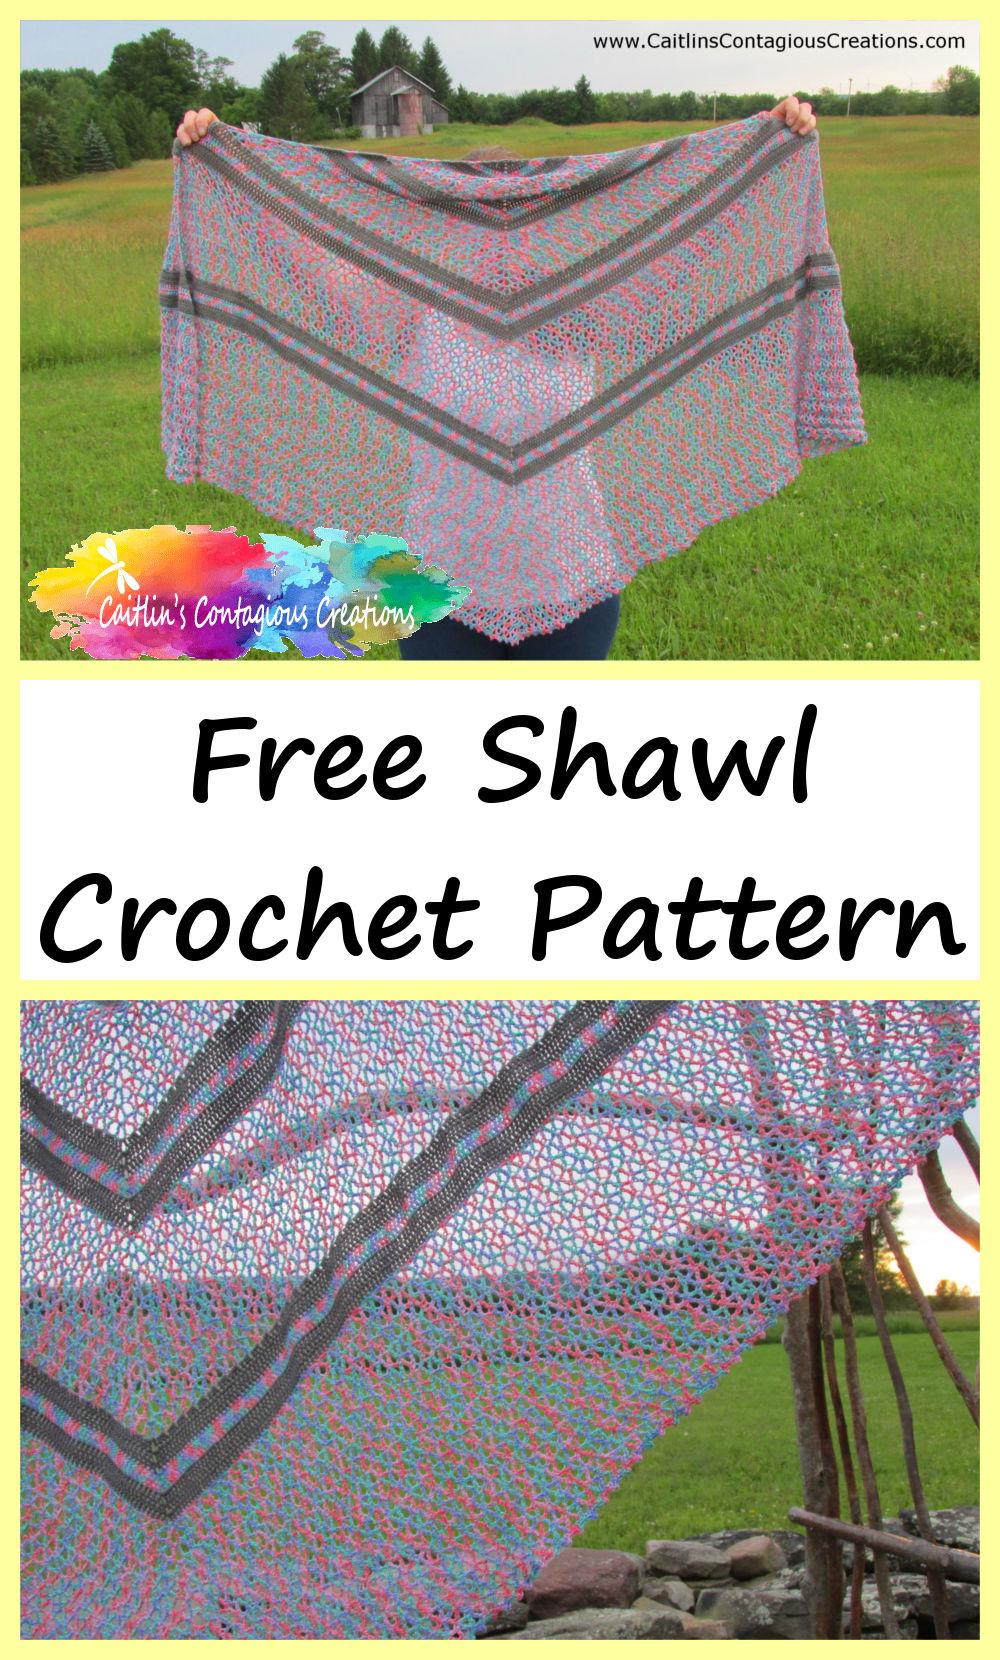 Summer Wildflowers Triangle Shawl Crochet Pattern